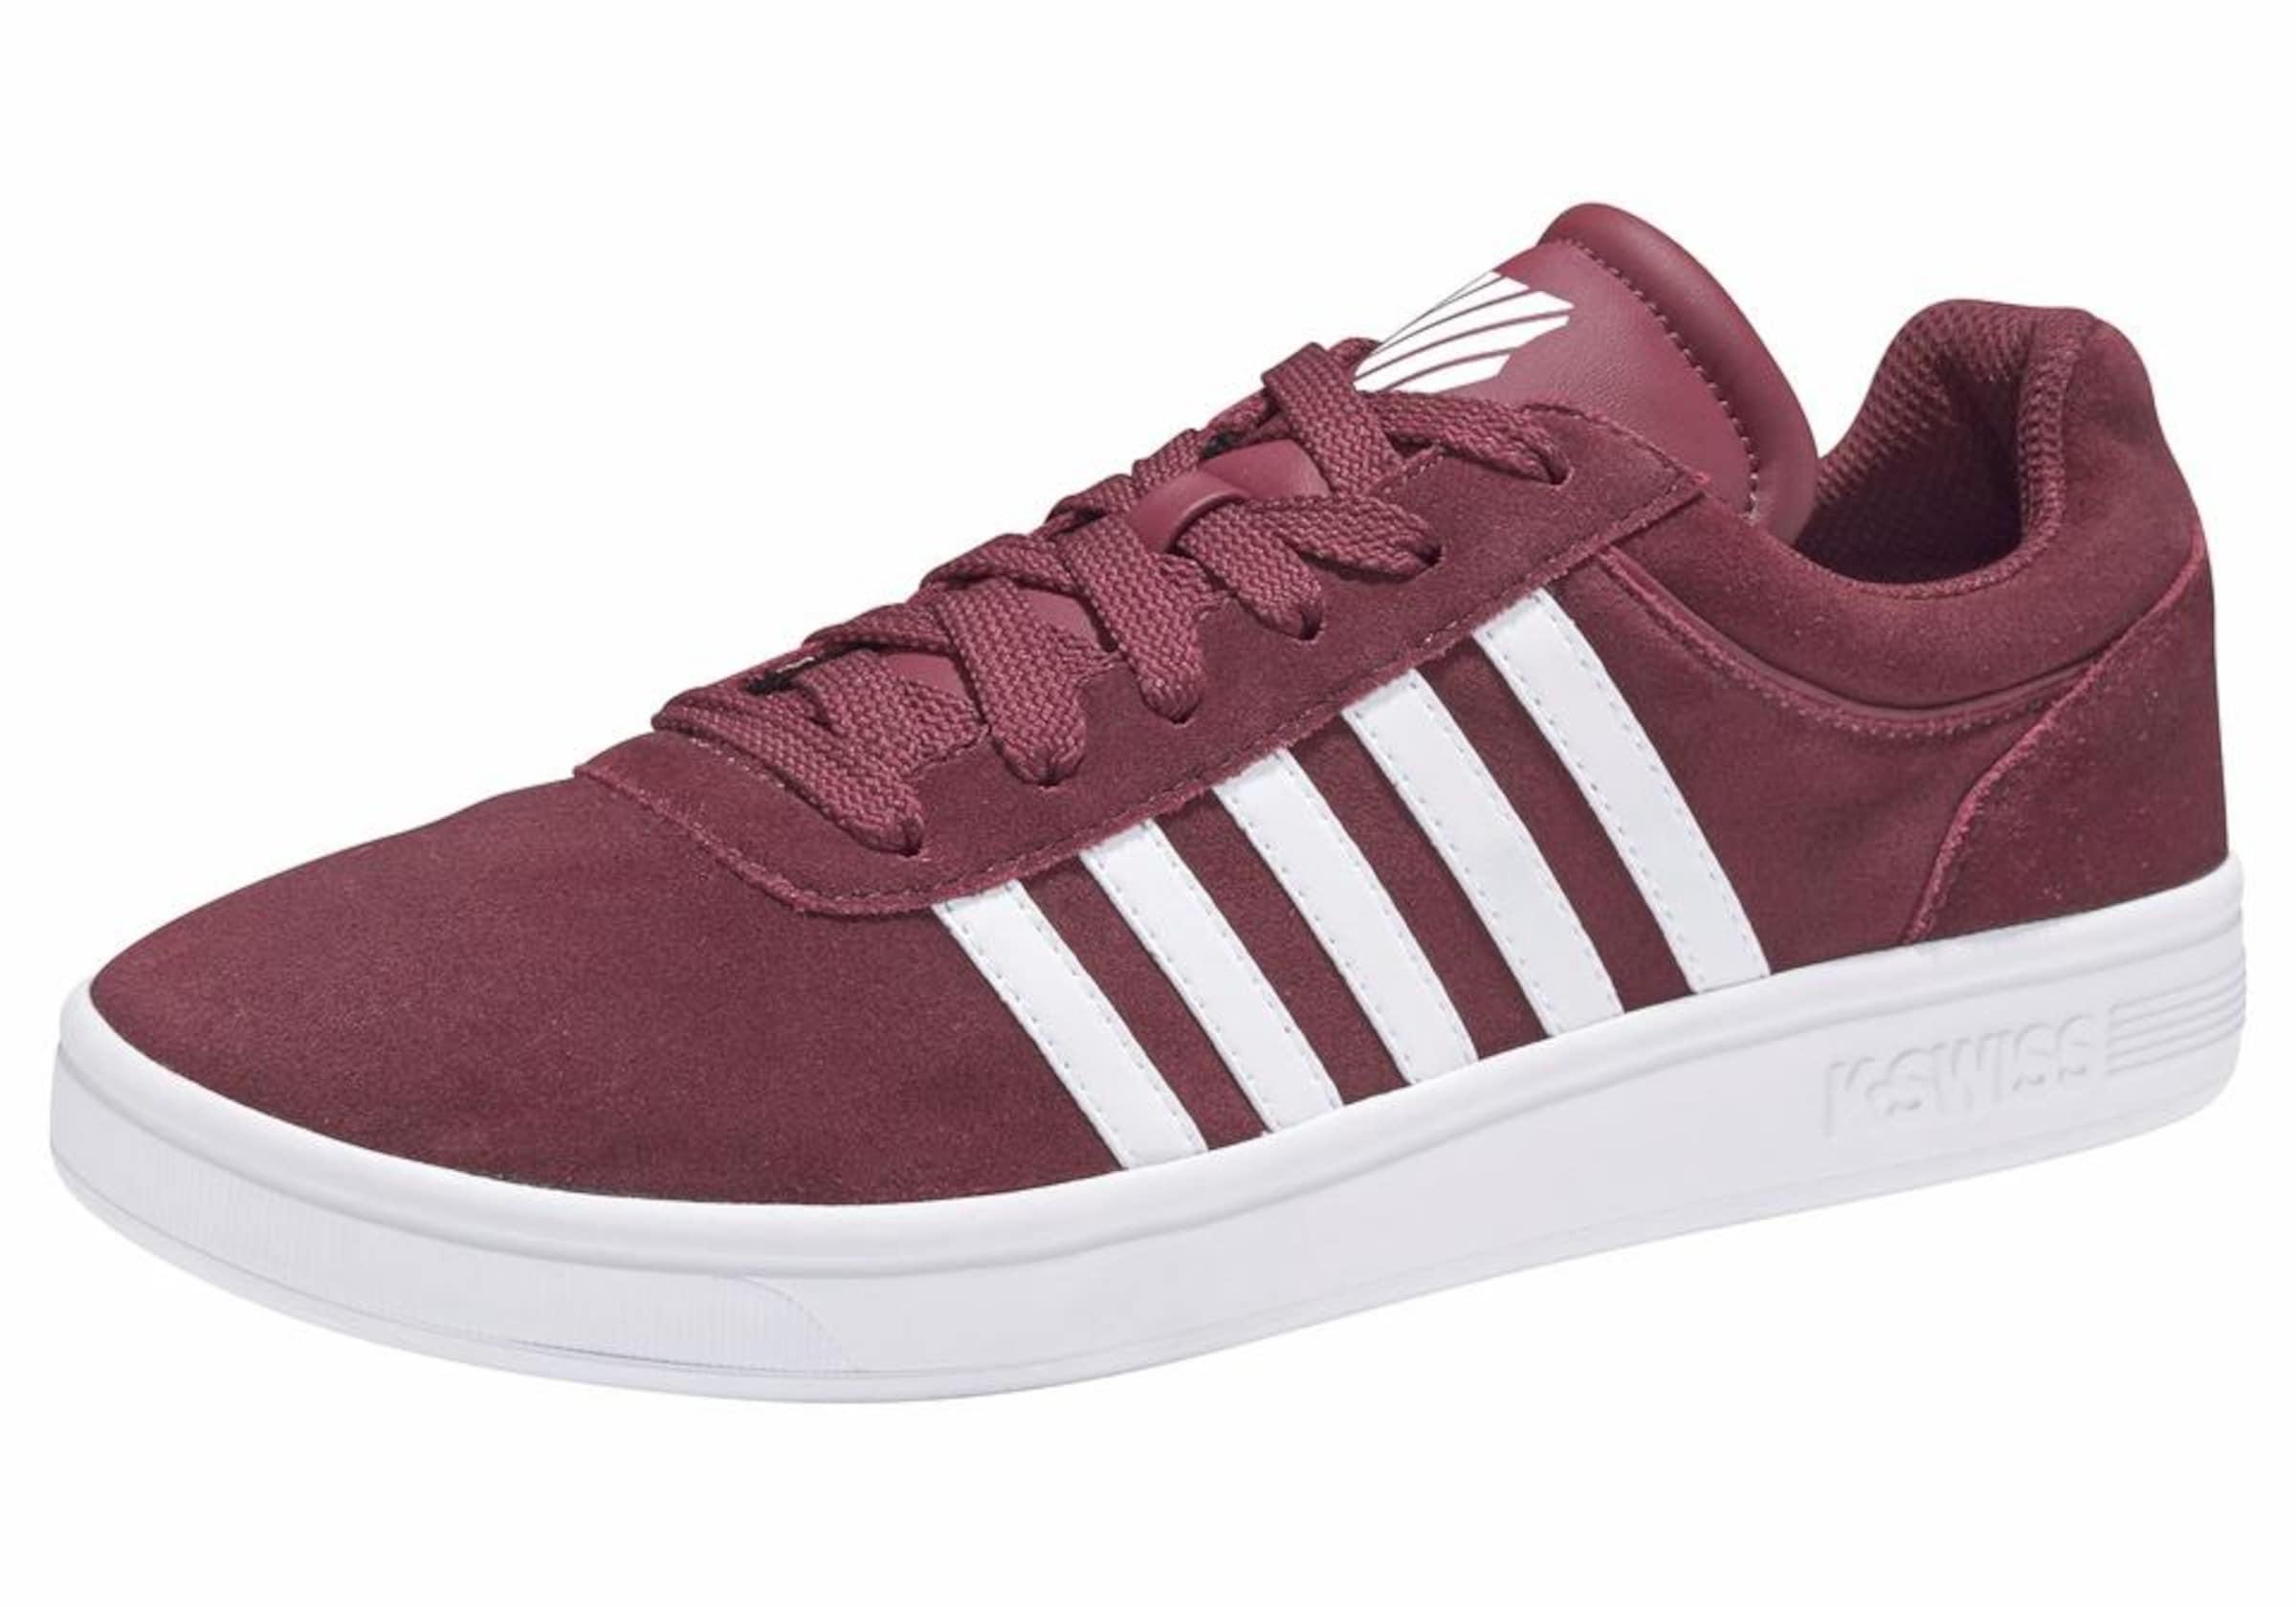 K-SWISS Sneaker  Court Cheswick Suede